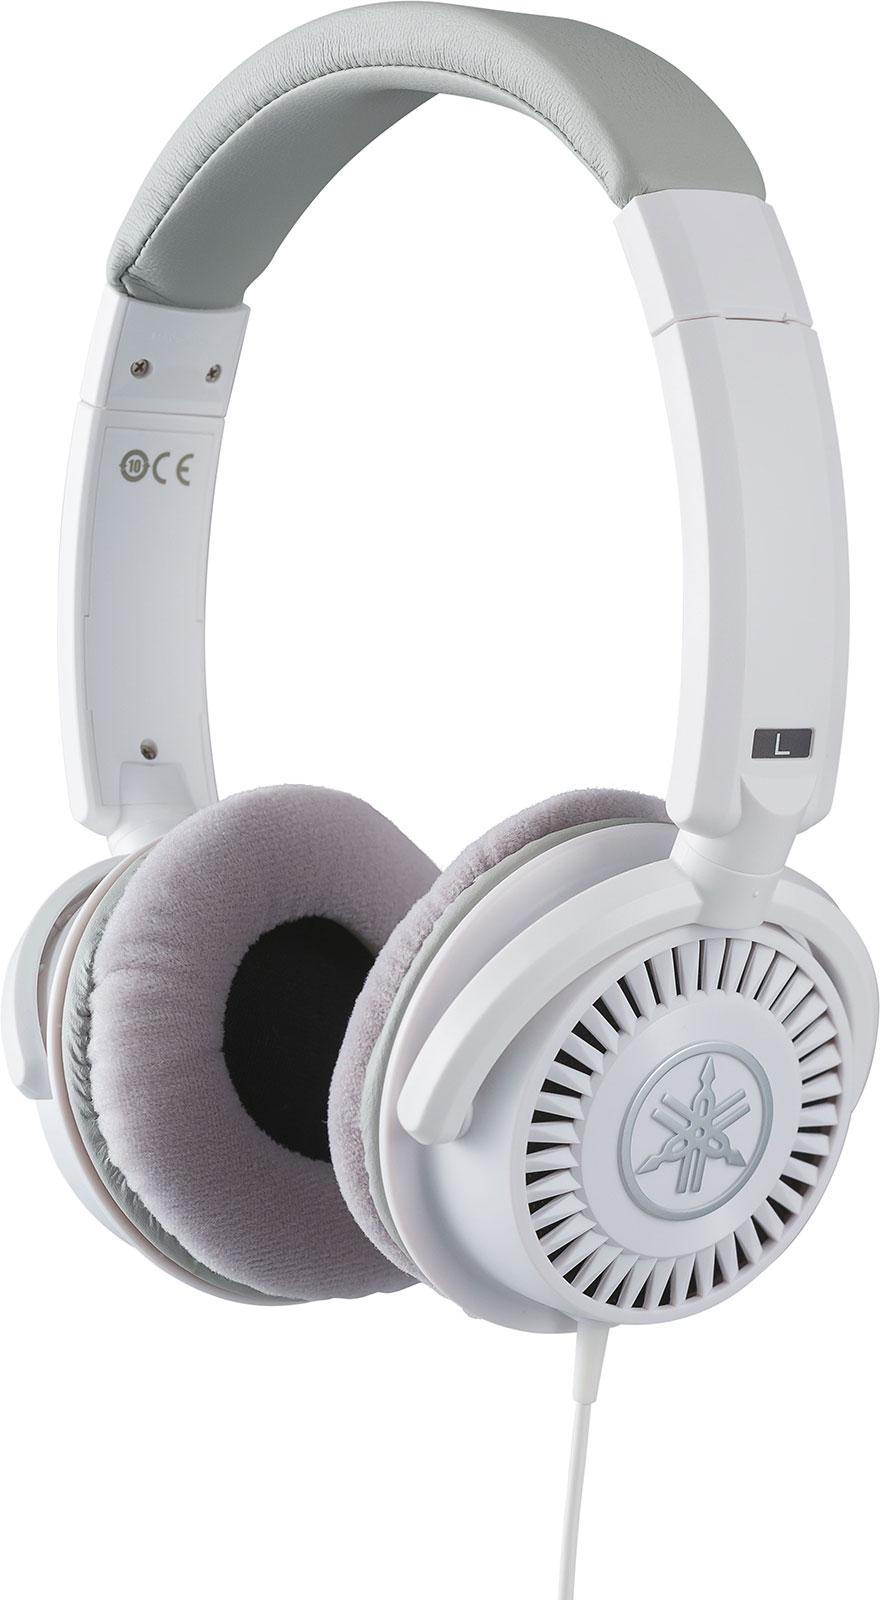 Billede af Yamah HPH-150 Open-air headphone, white